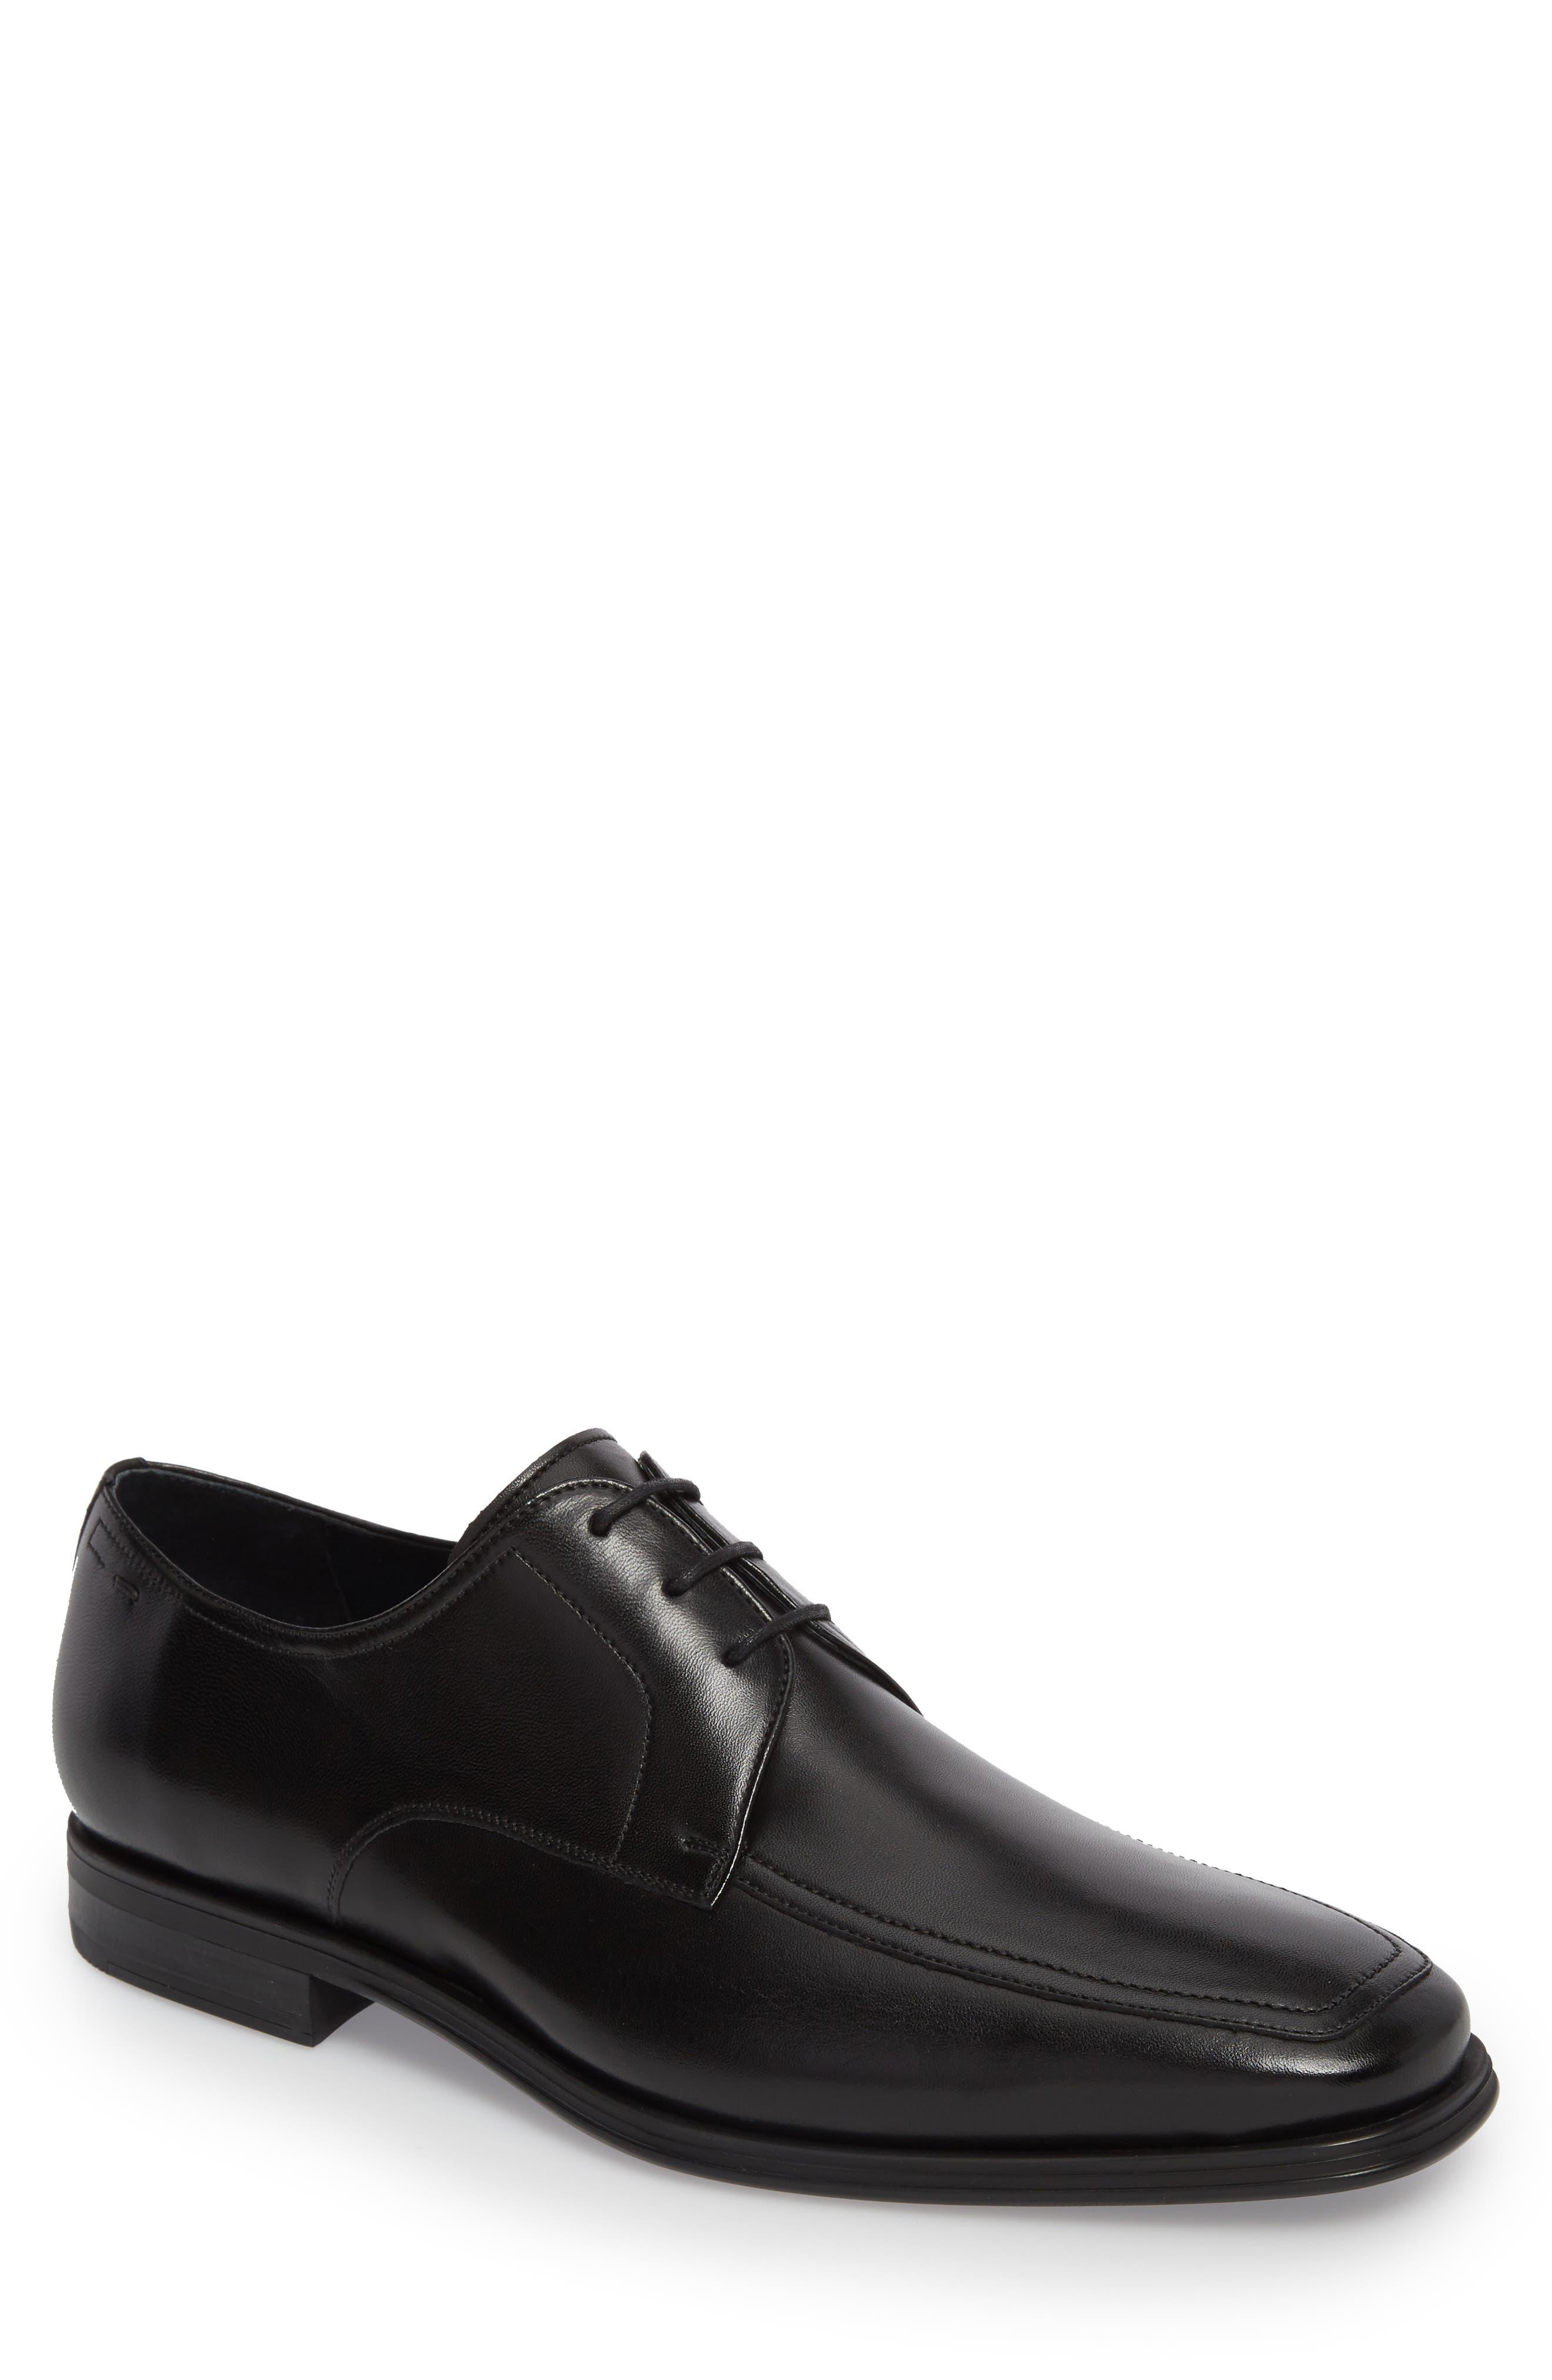 MAGNANNI Men'S Antonio Leather Lace-Up Oxfords in Black